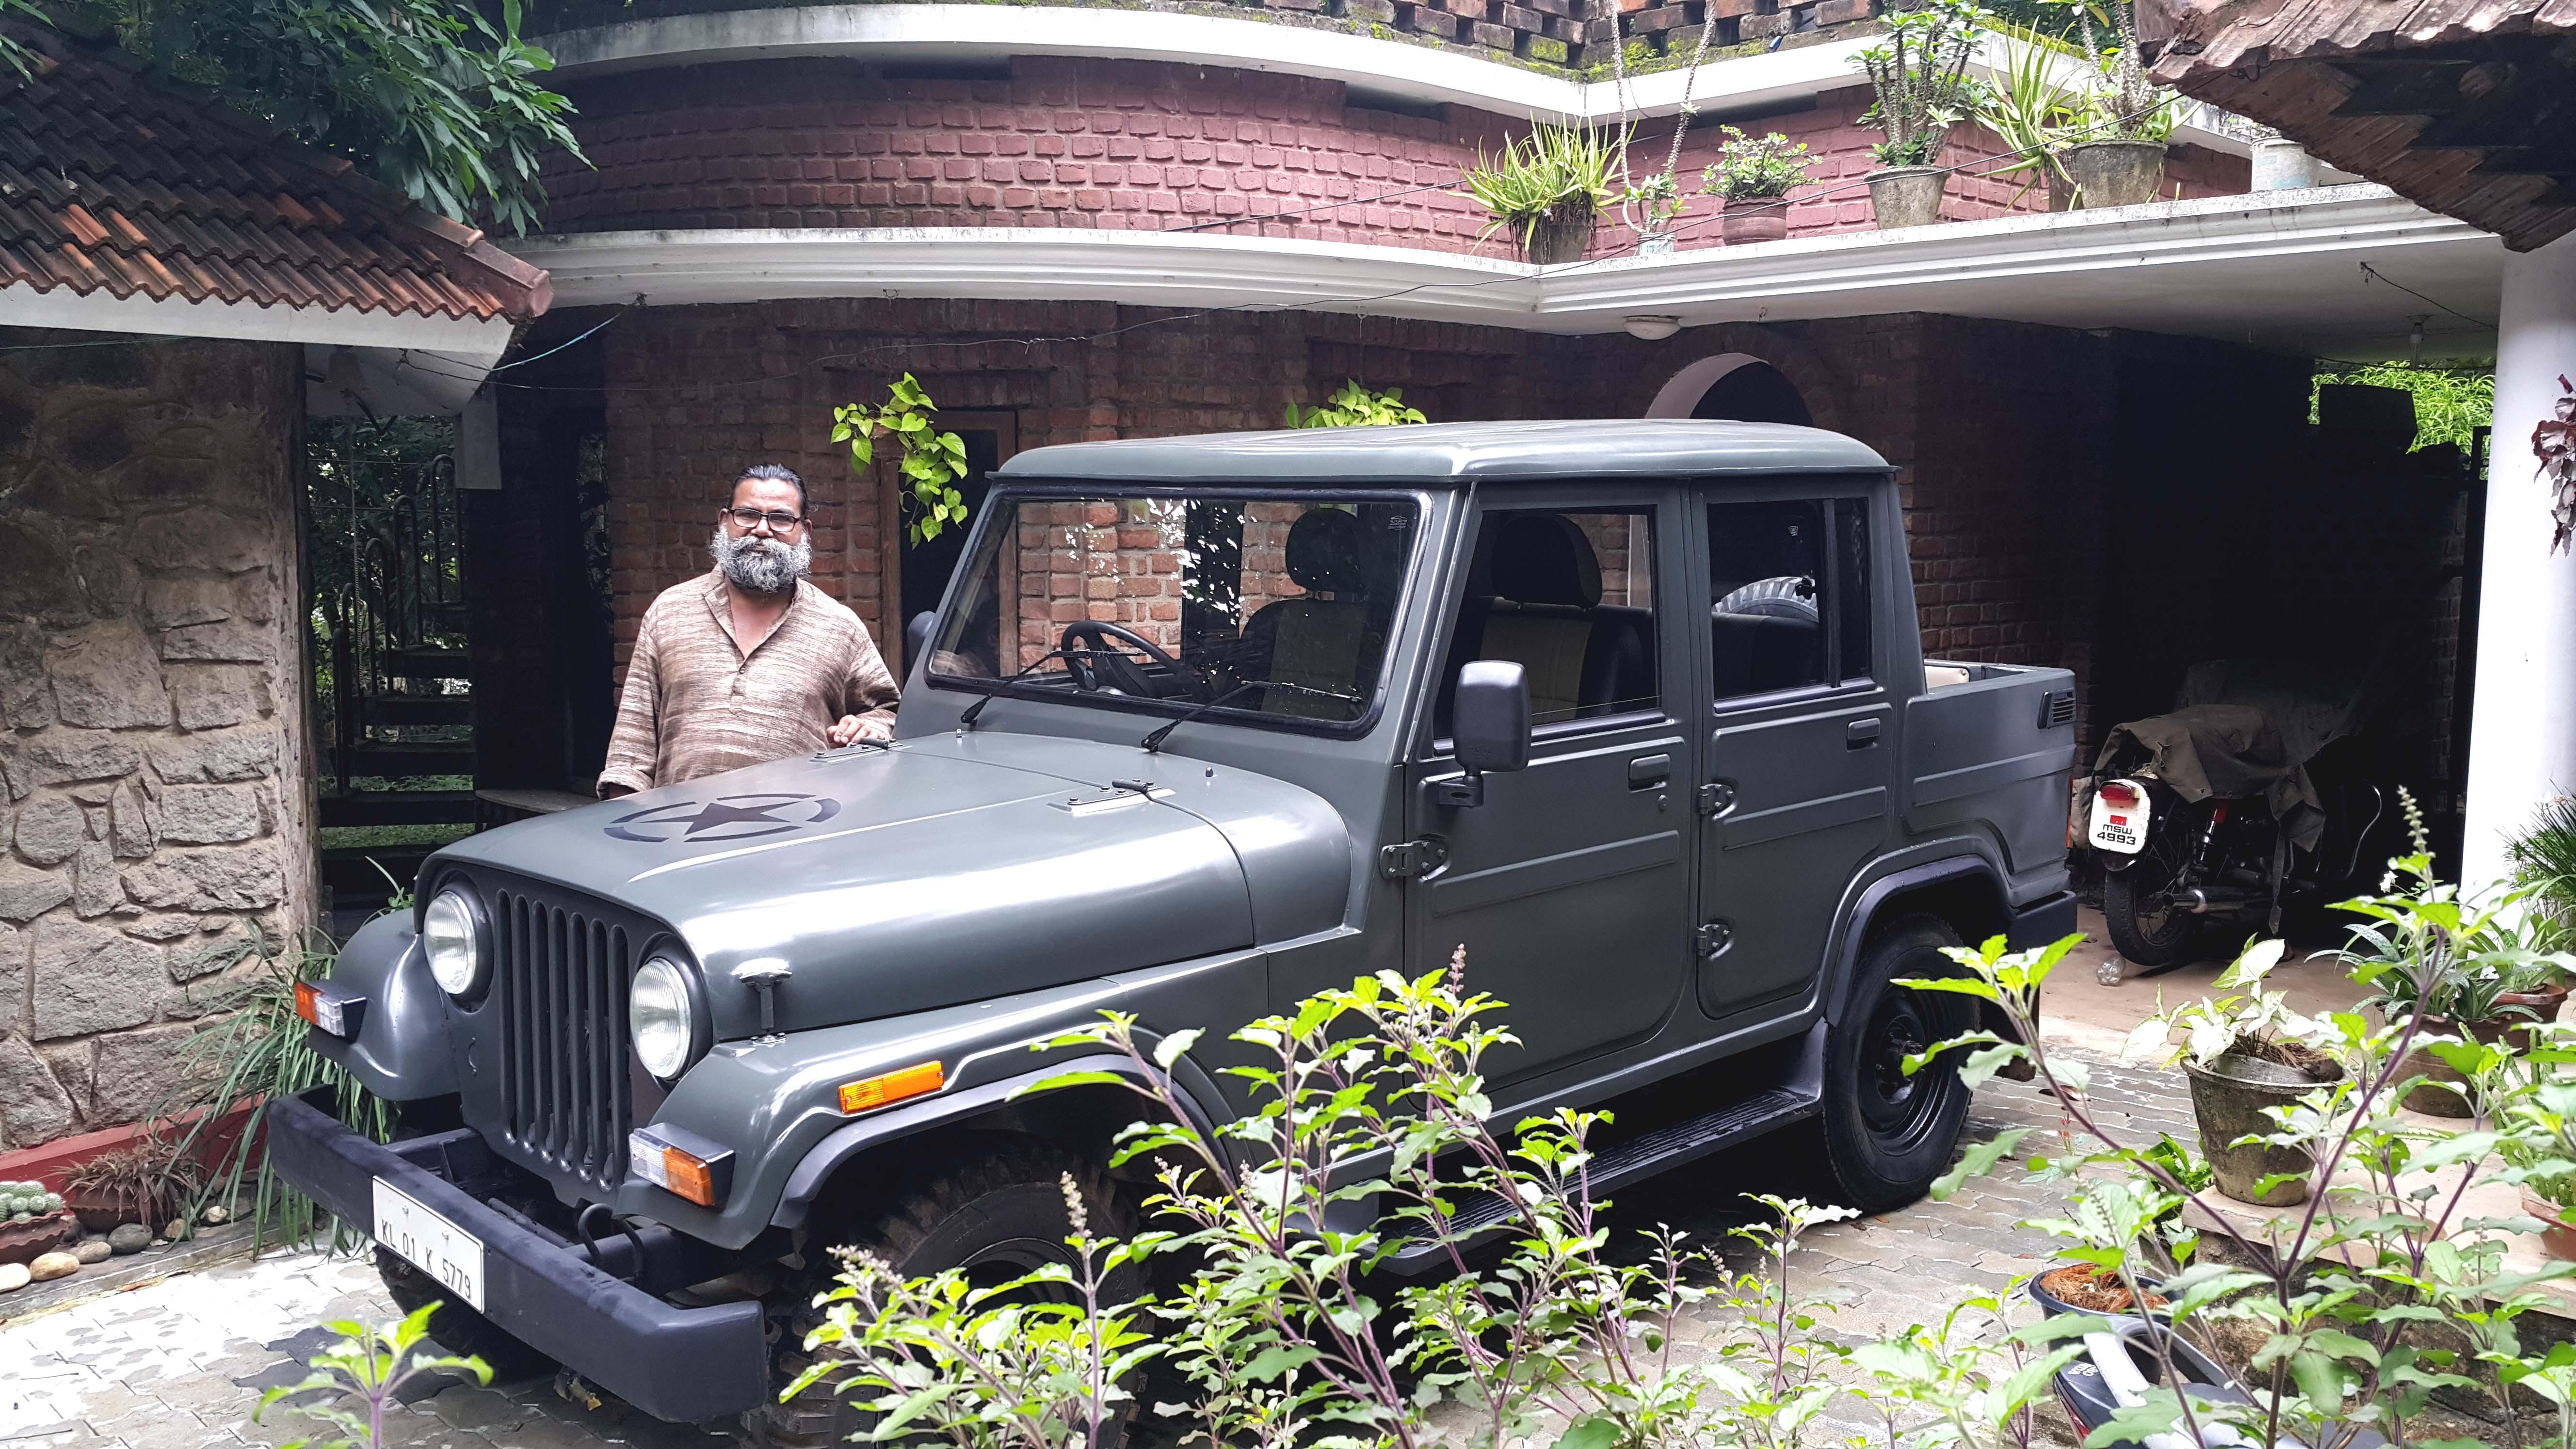 file:altration jeep commander - wikimedia commons